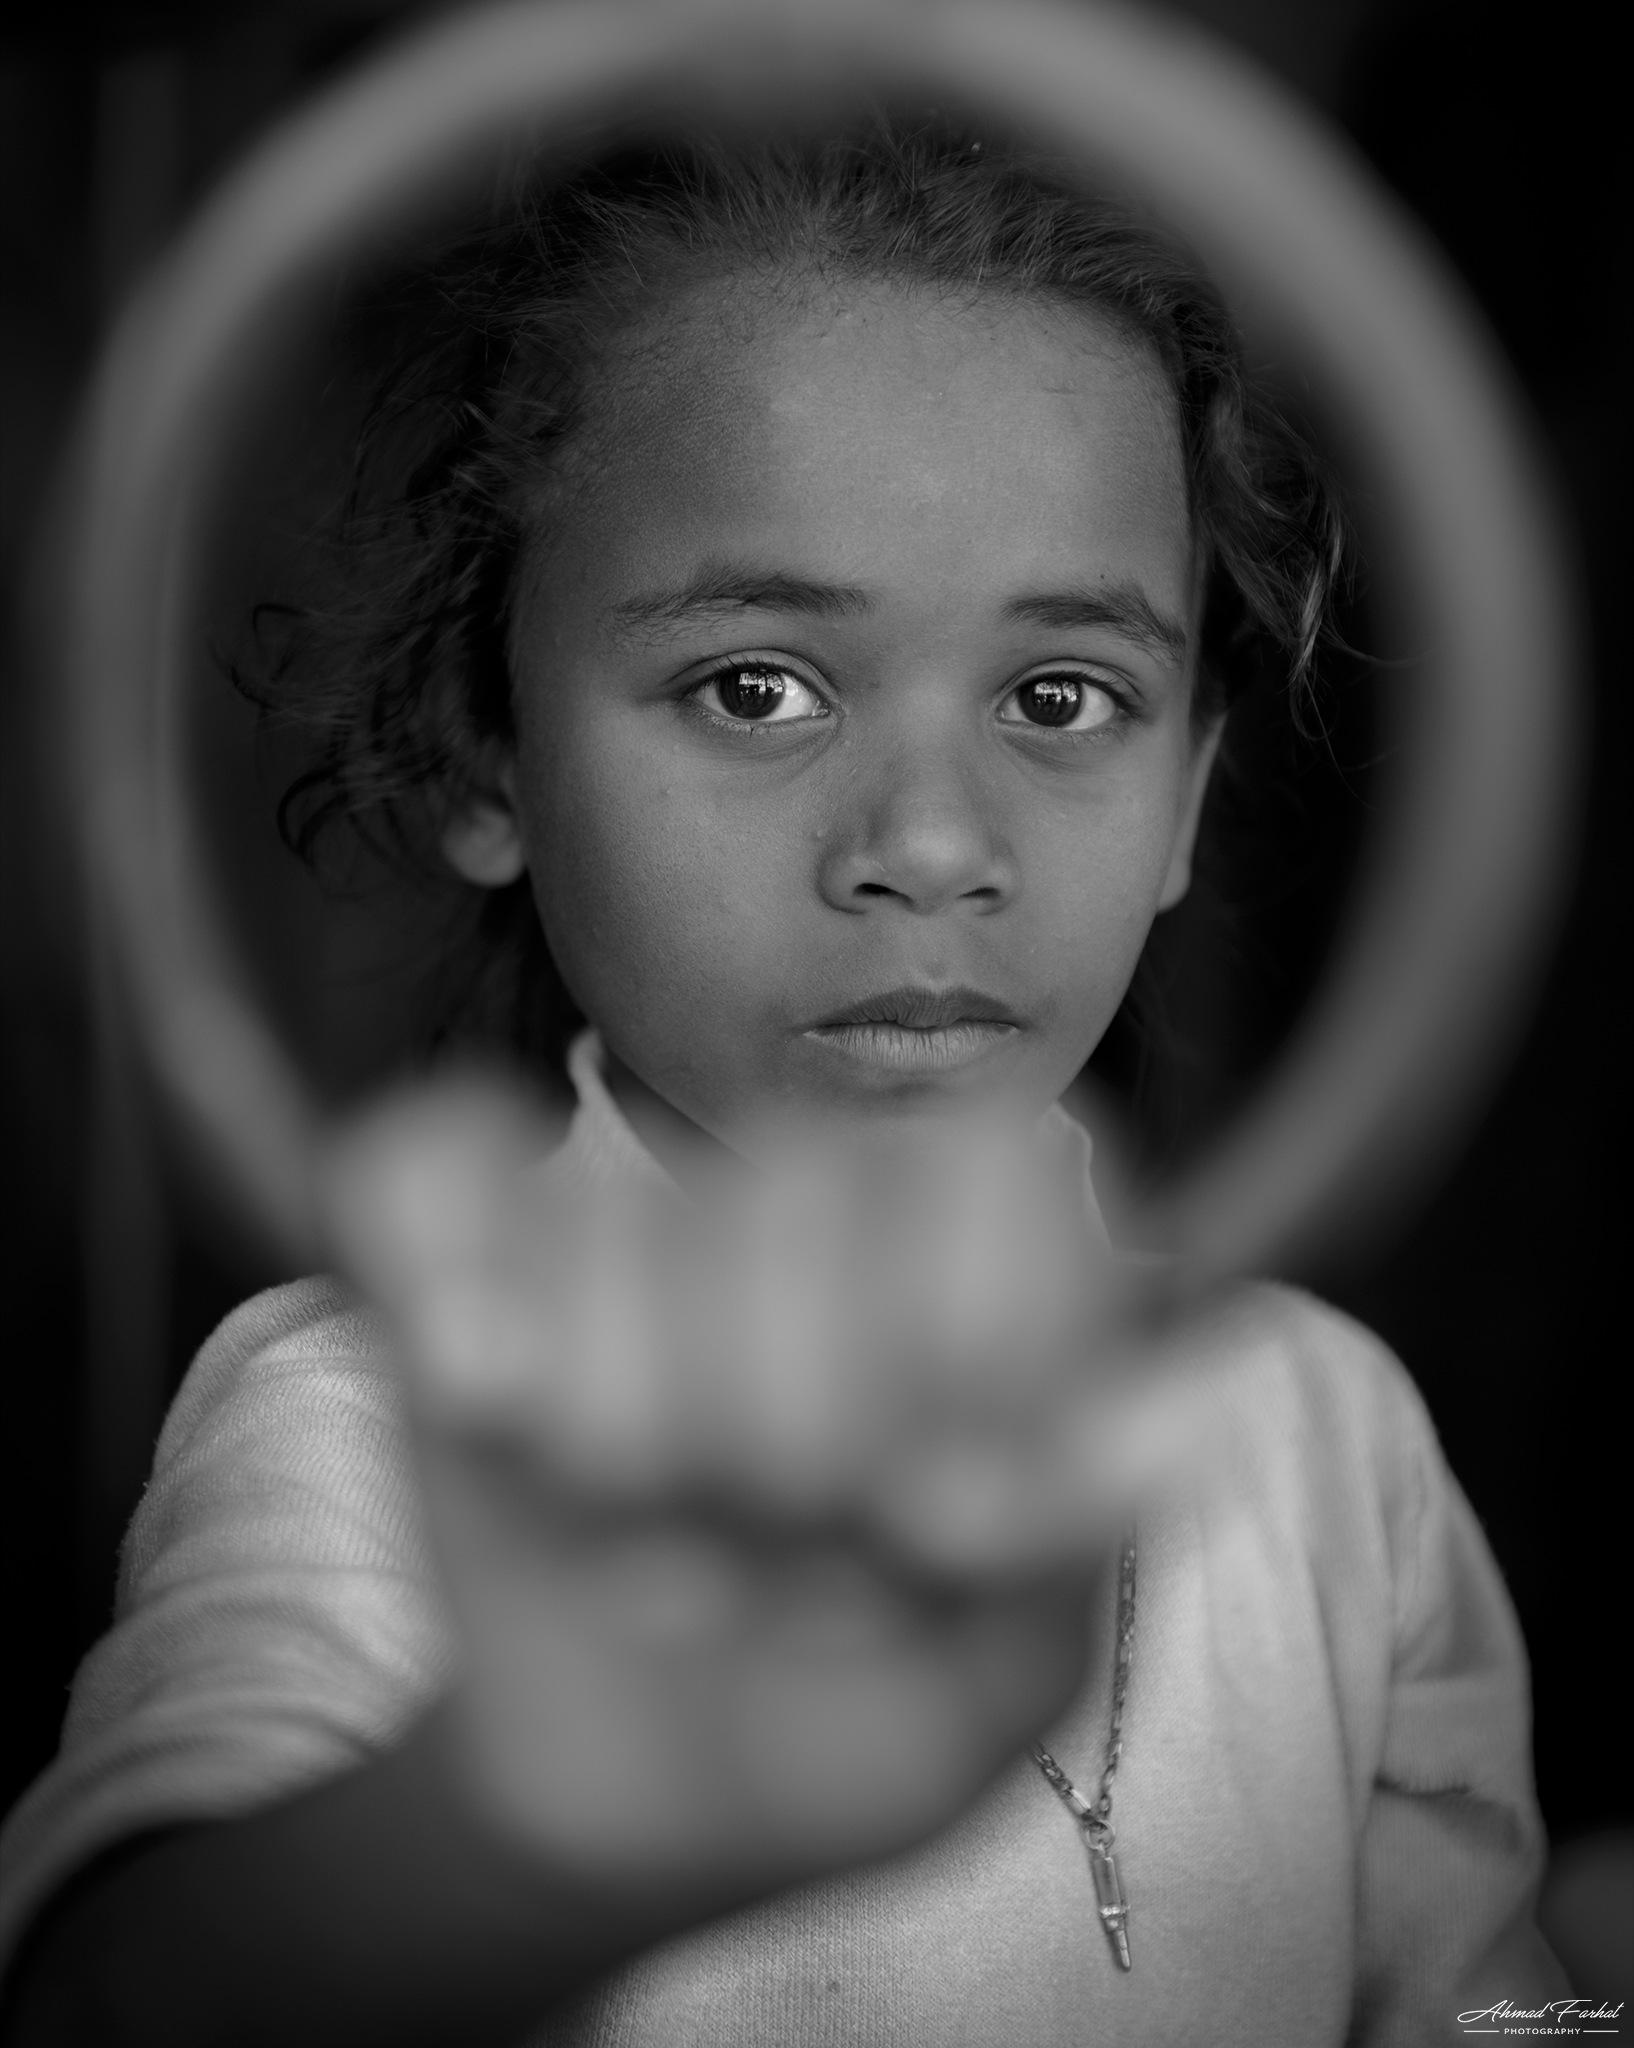 A girl in the street by Ahmad Farhat